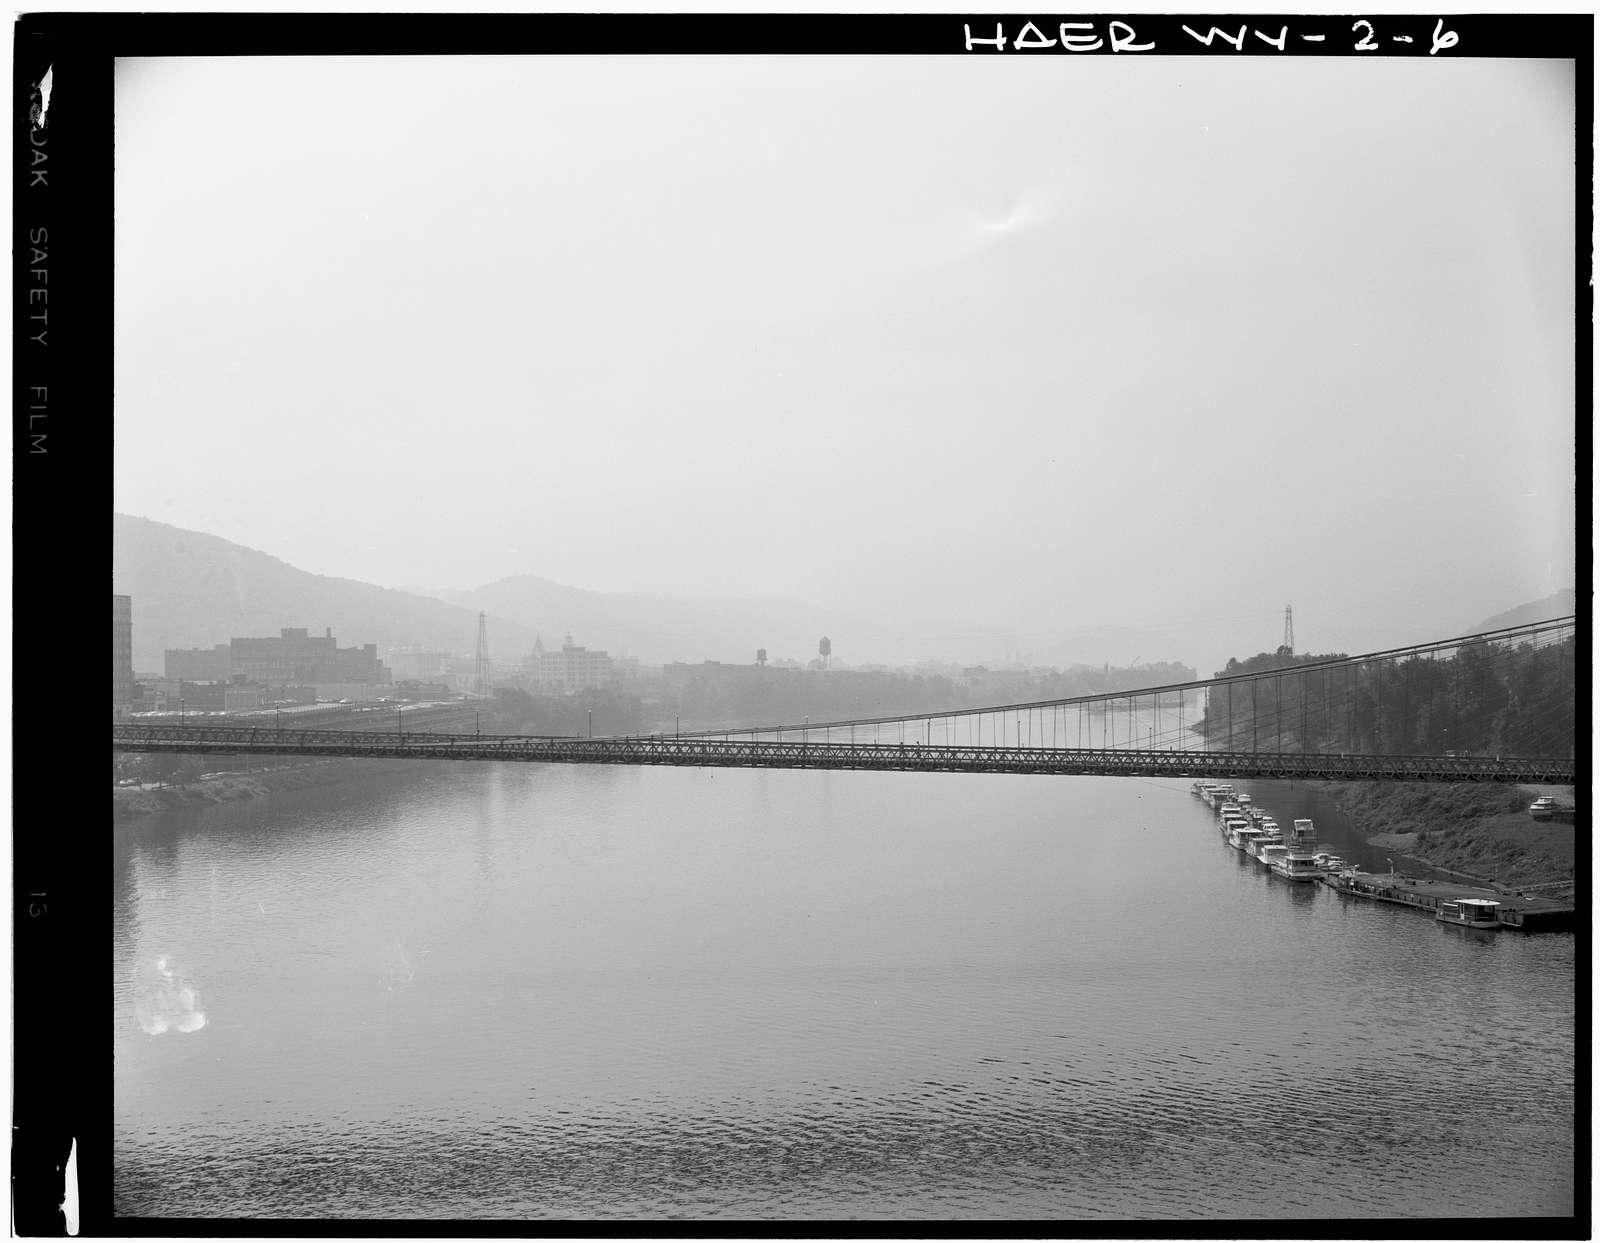 Wheeling Suspension Bridge, Spanning East channel of Ohio River at U.S. Route 40, Wheeling, Ohio County, WV